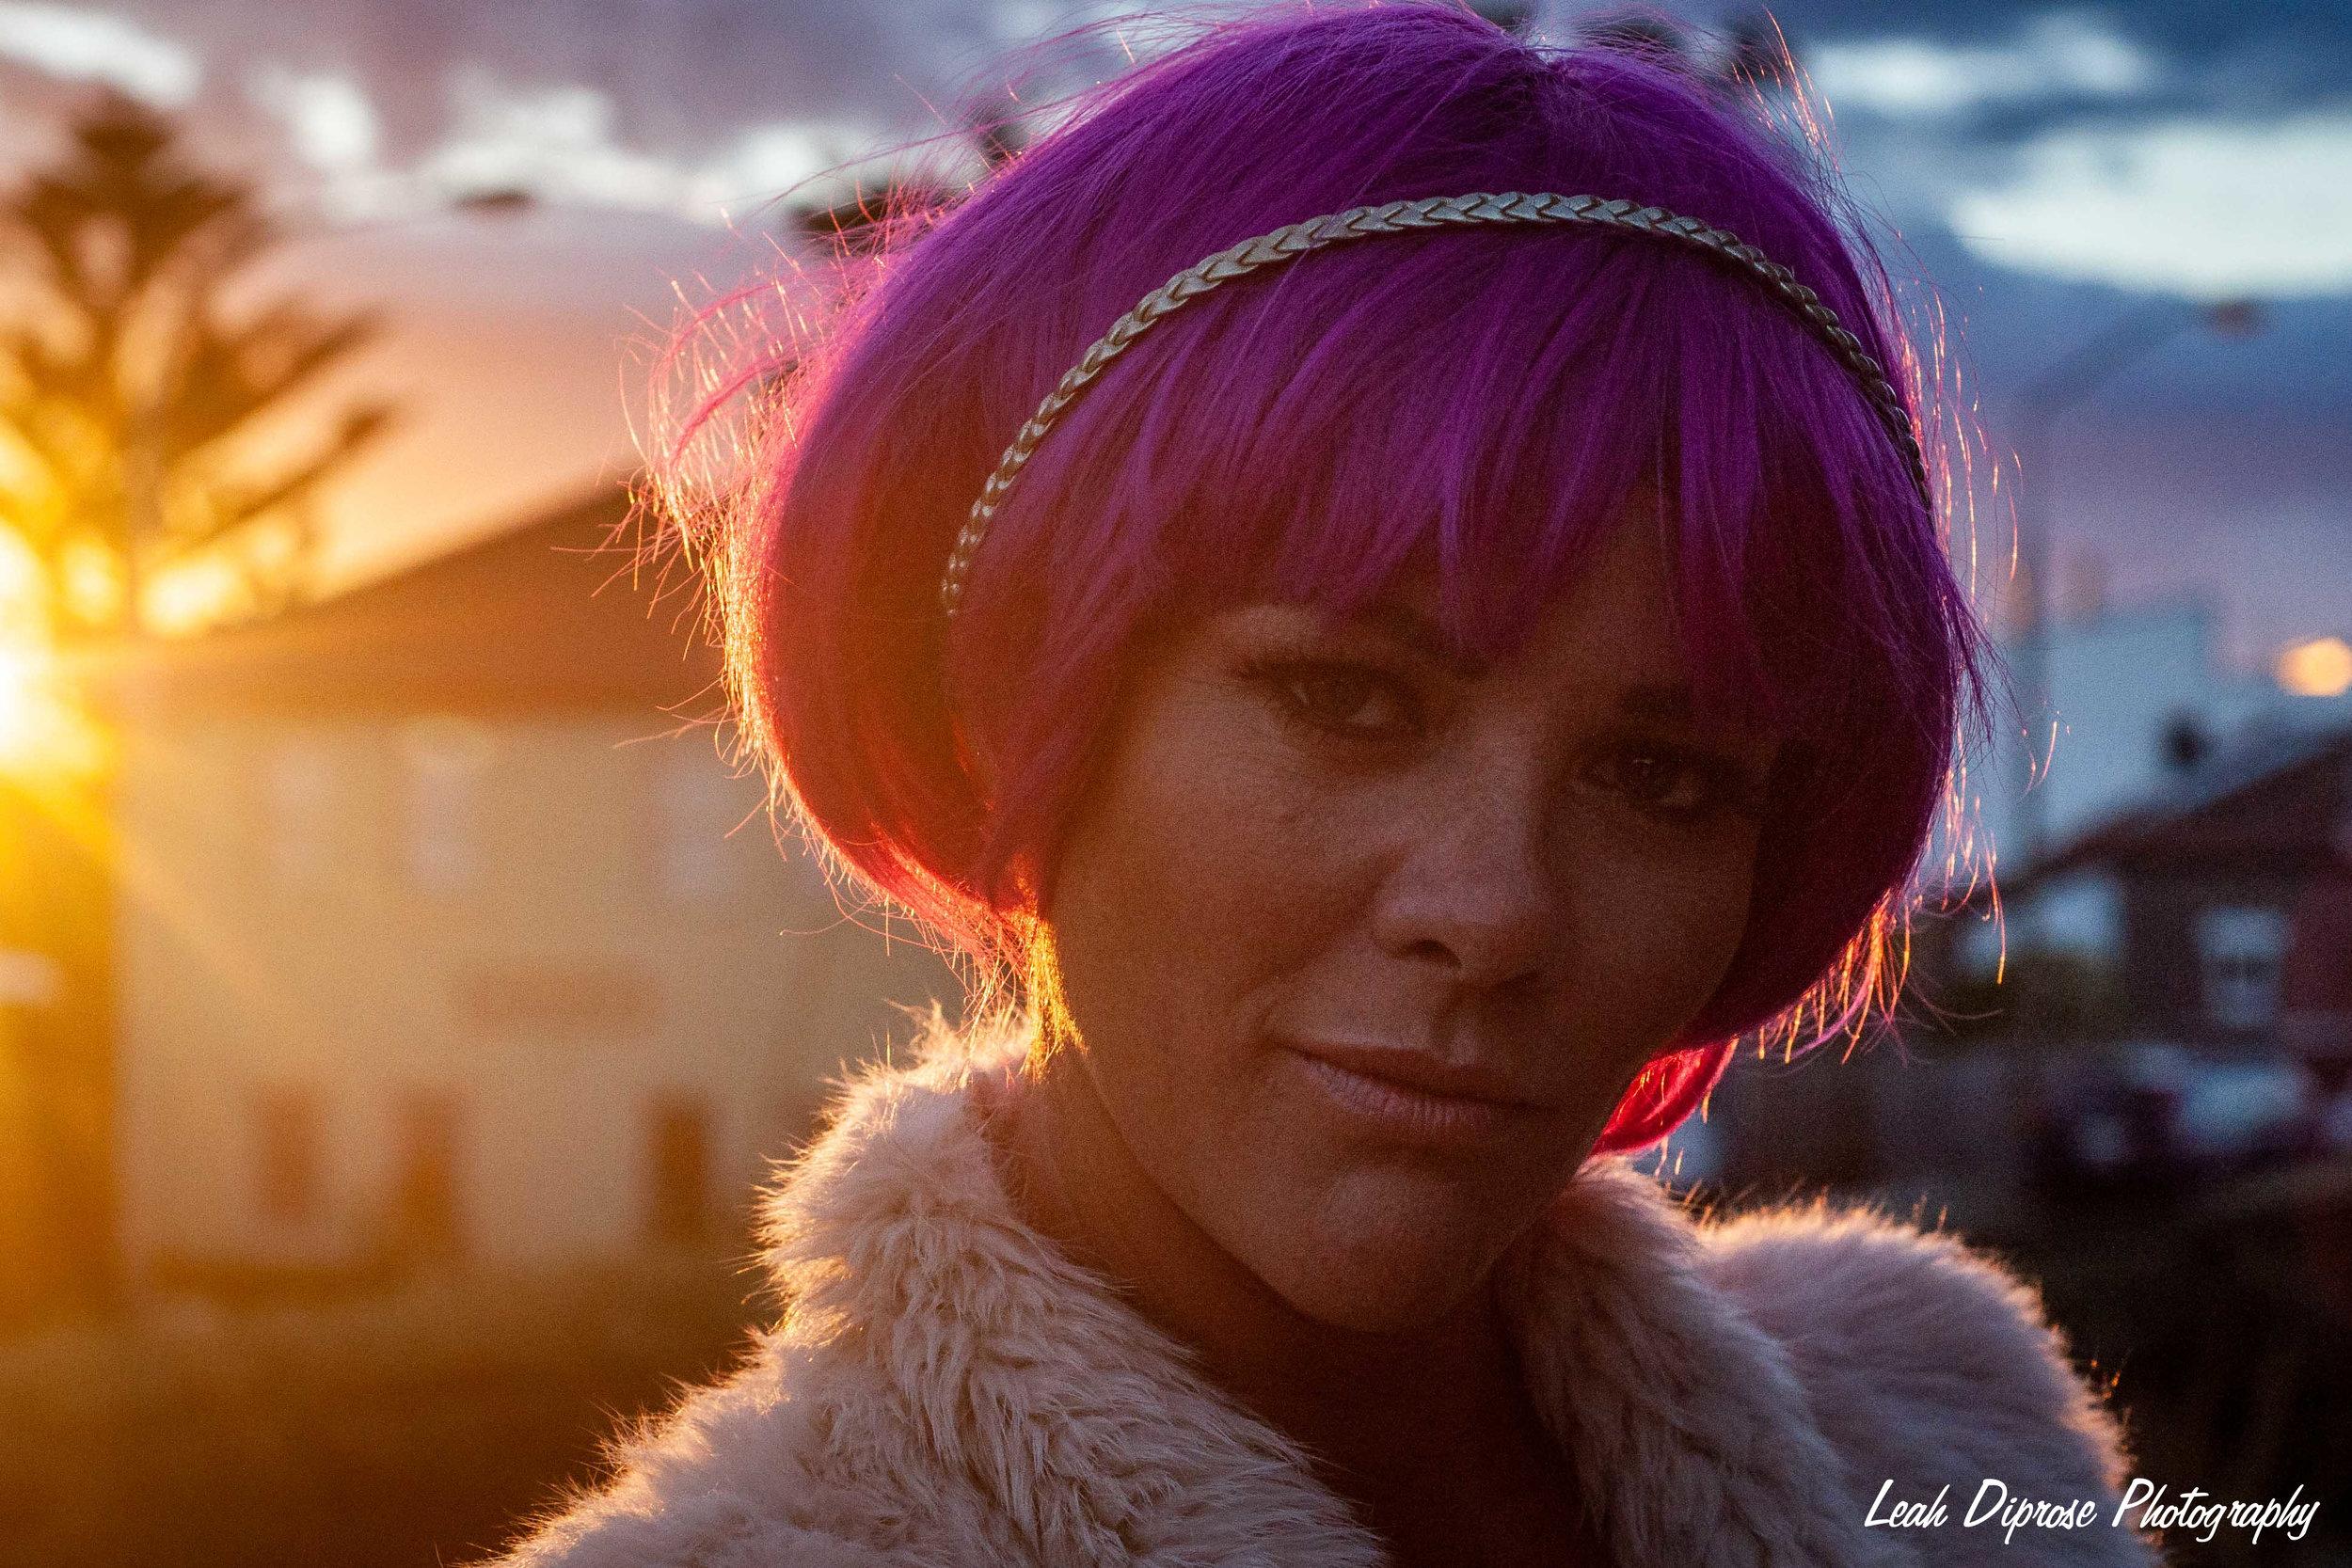 Leah Diprose Photography image-0100.jpg